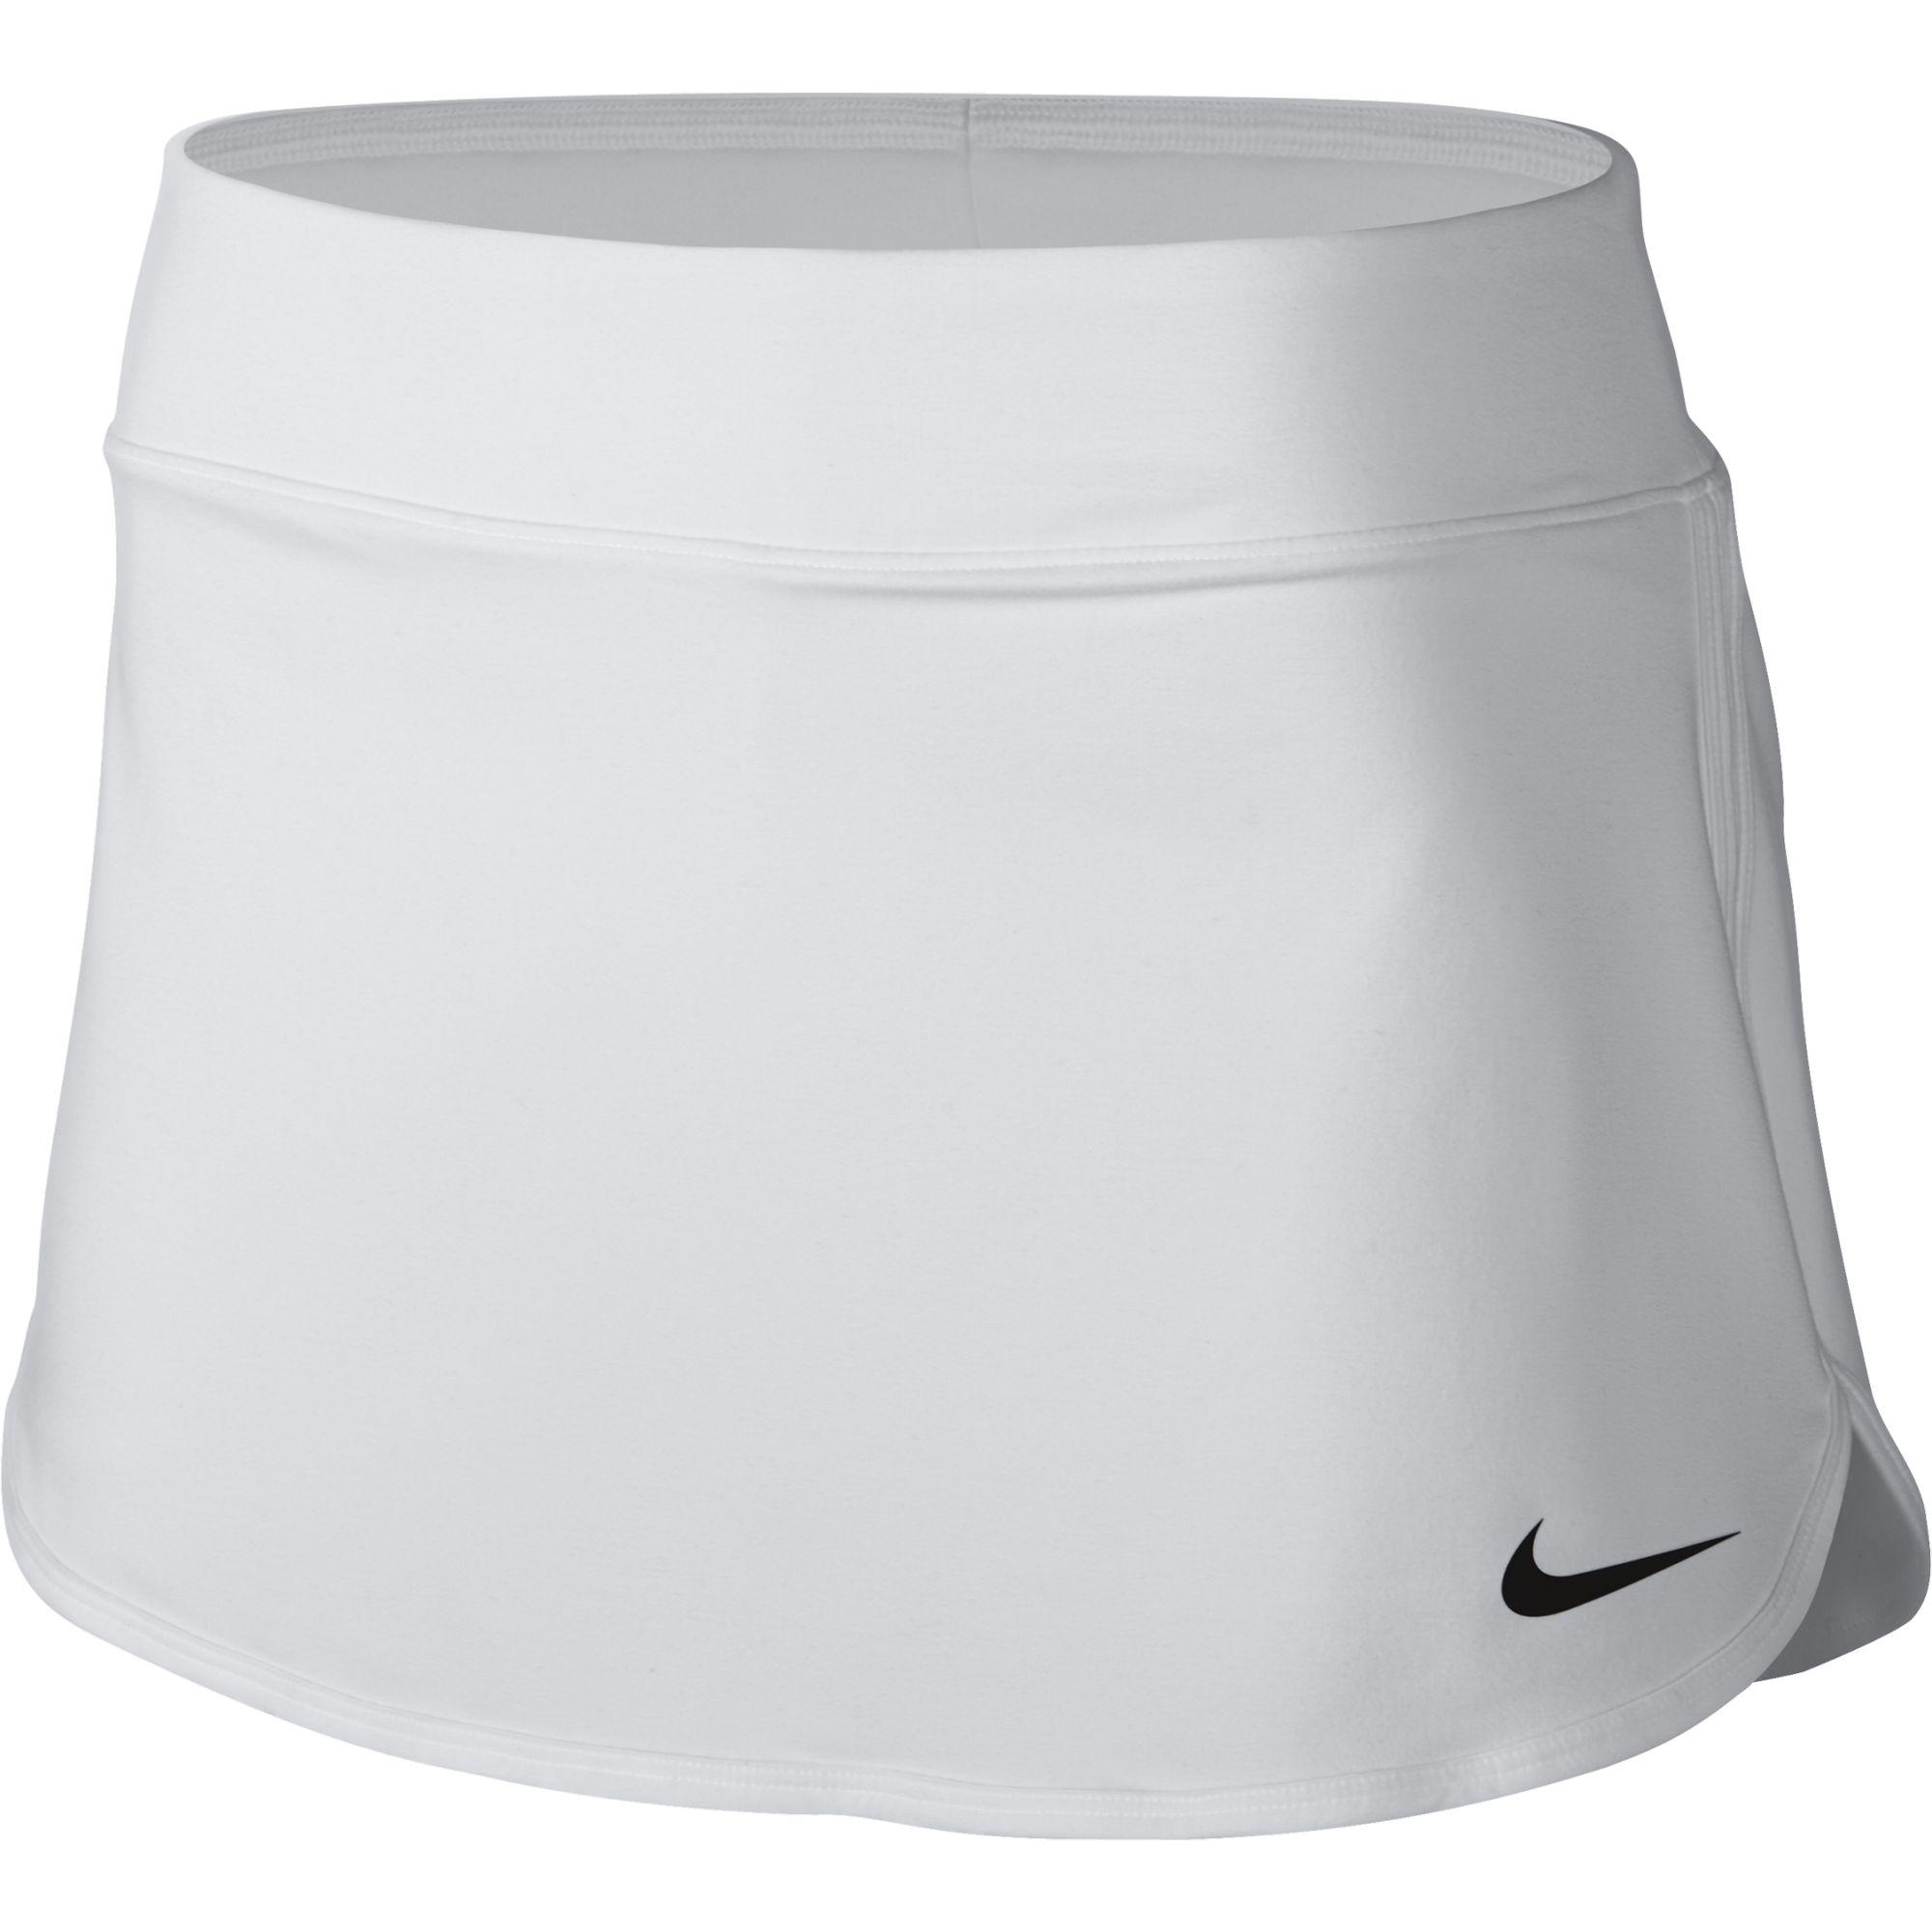 272e64ae83 Nike Court Pure Tennis Skirt White/Black női tenisz ruházat - Match ...